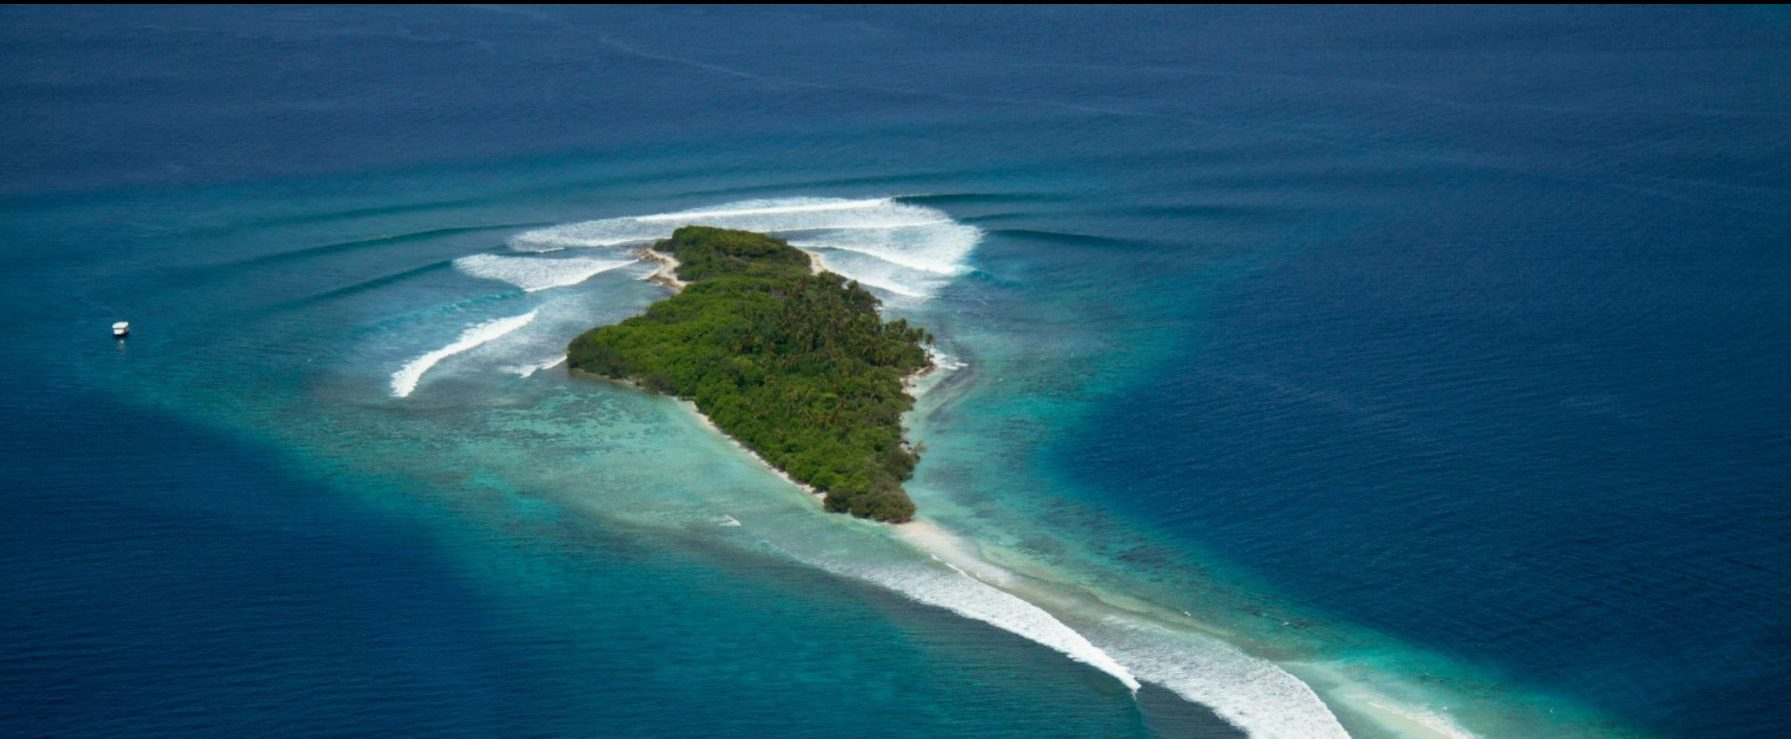 Sultans Break Maldives Waves Surfatoll